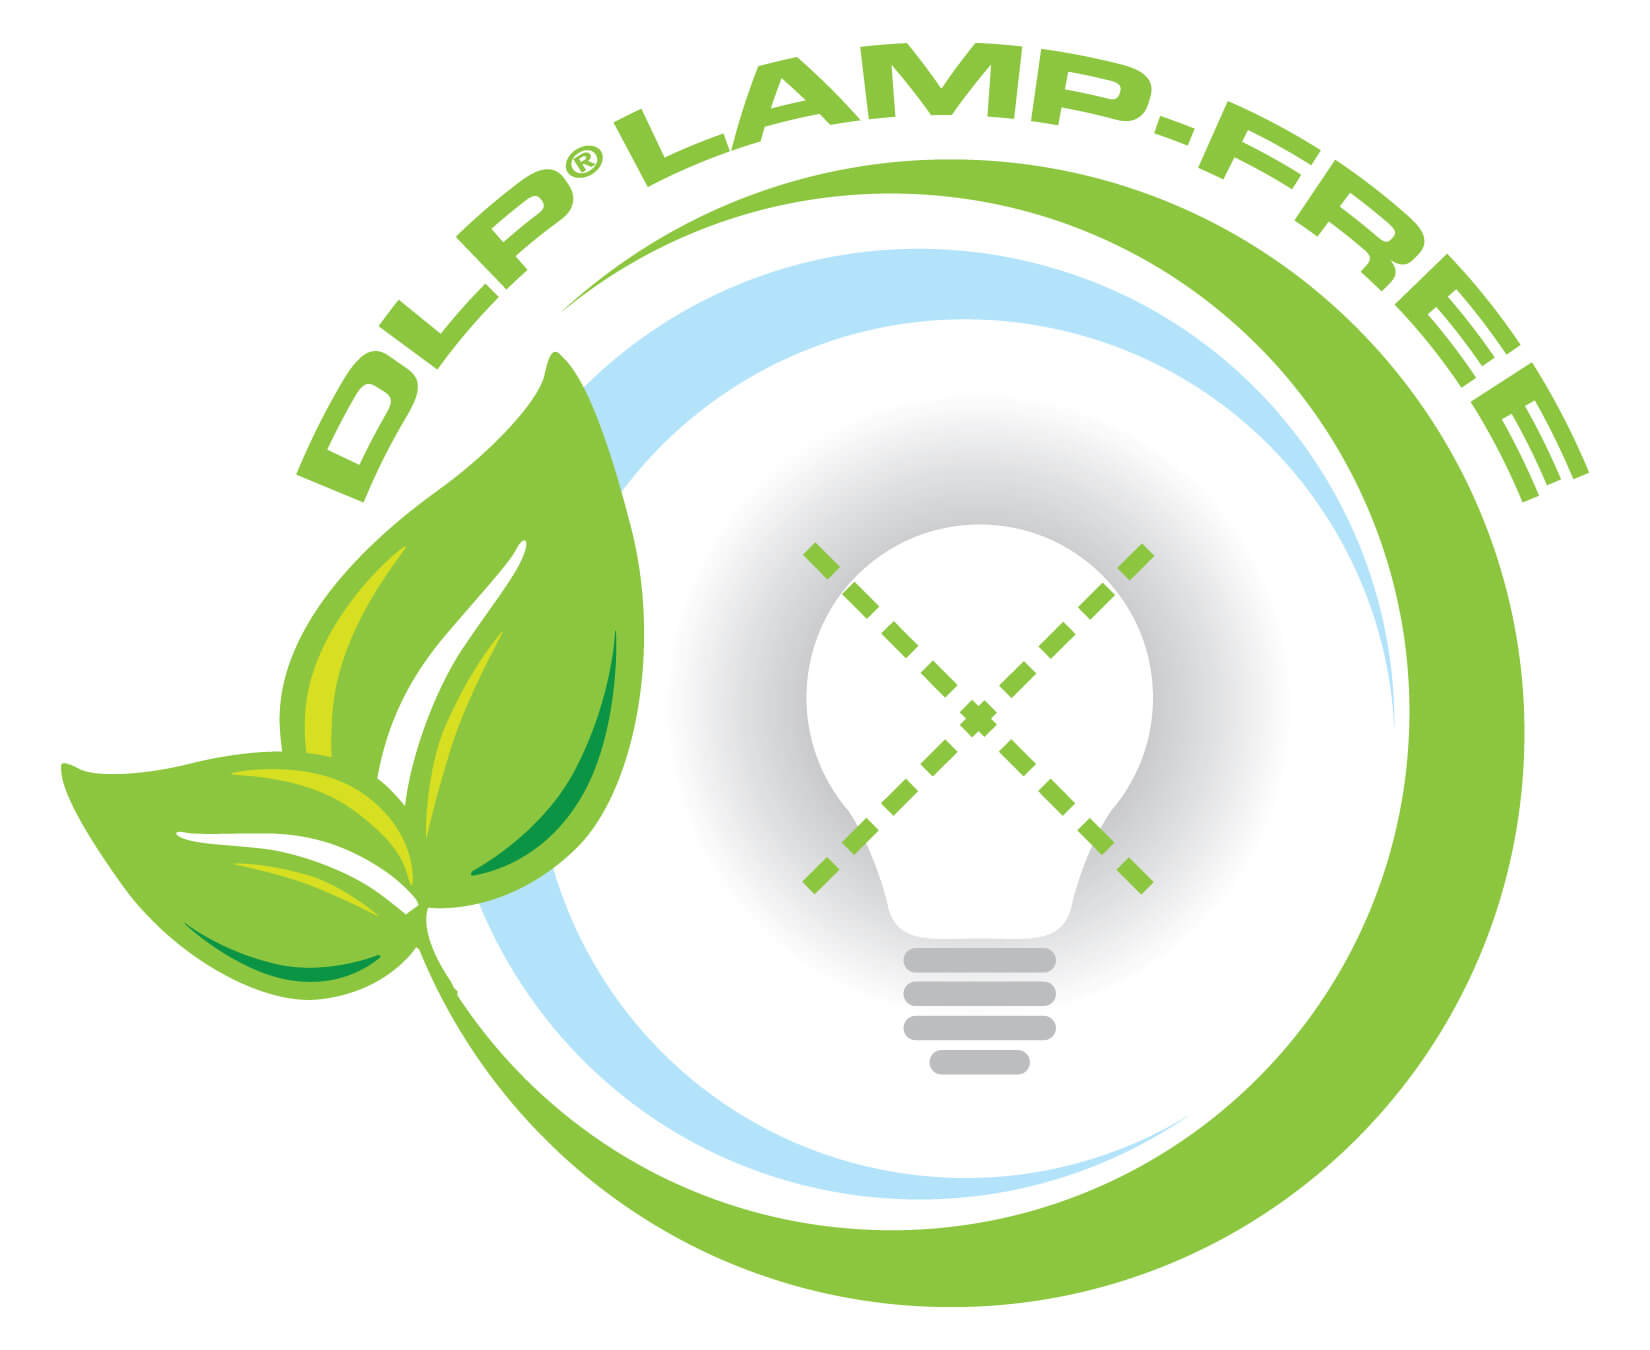 LG DLP Lamp Free Icon - DLP Lamp Free von LG